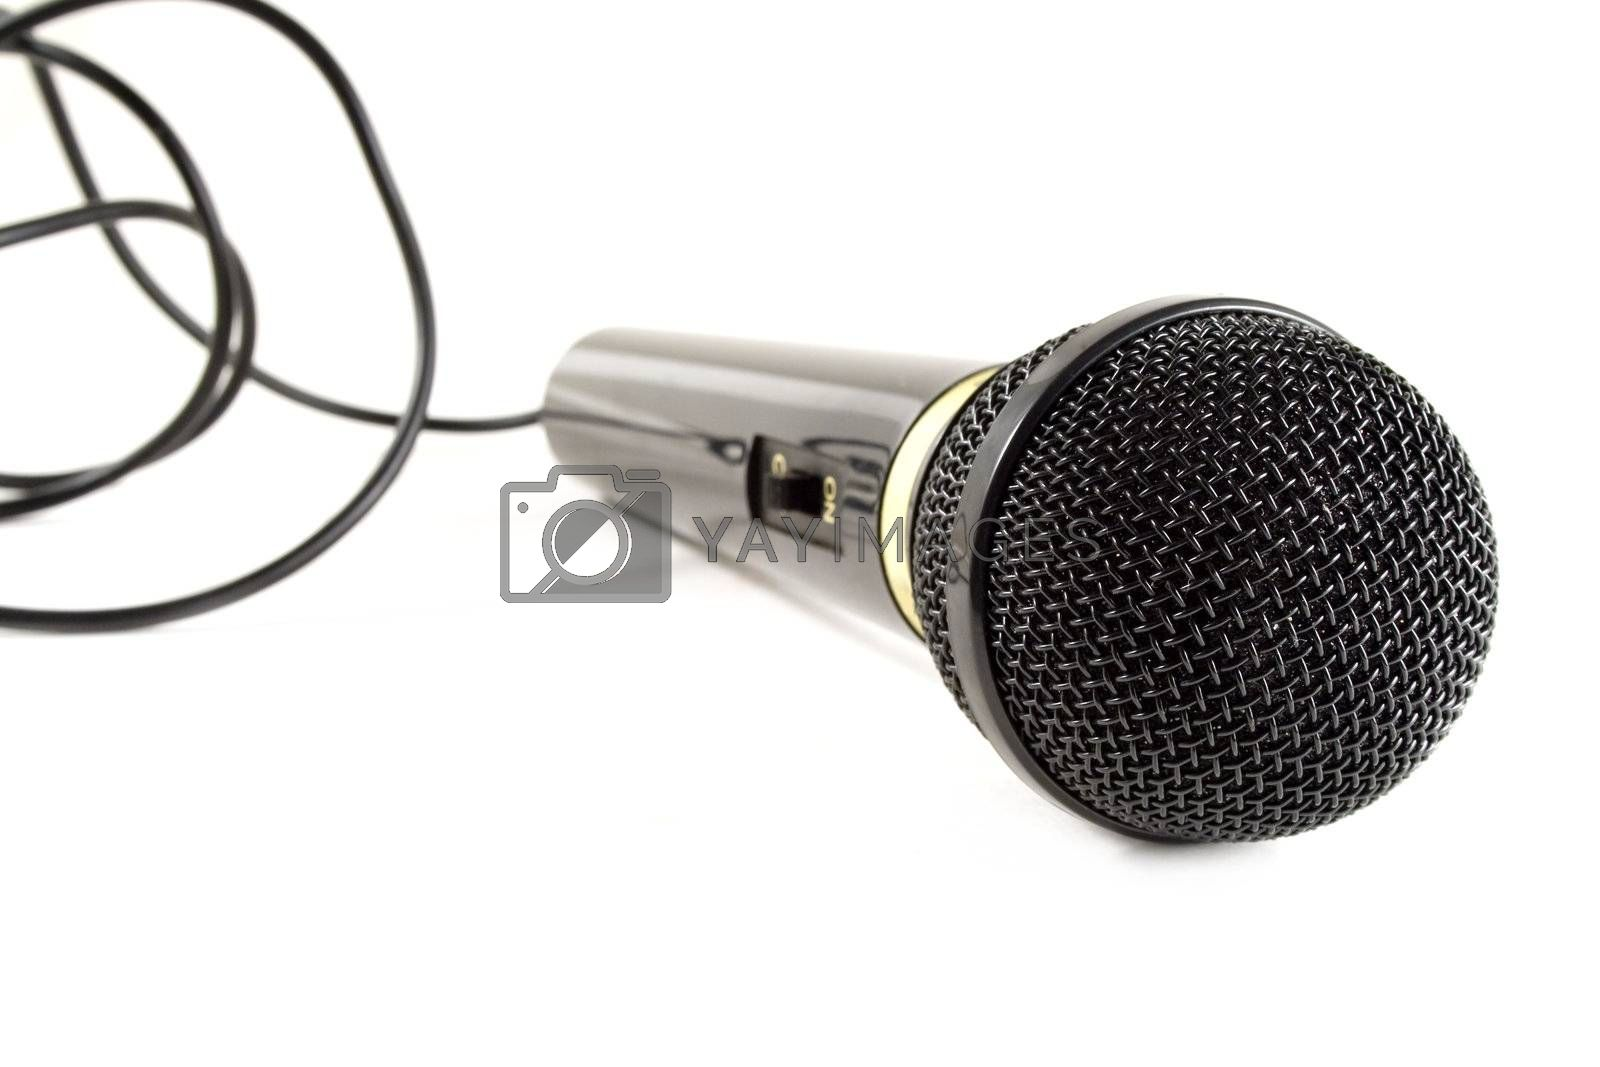 Microphone by PauloResende